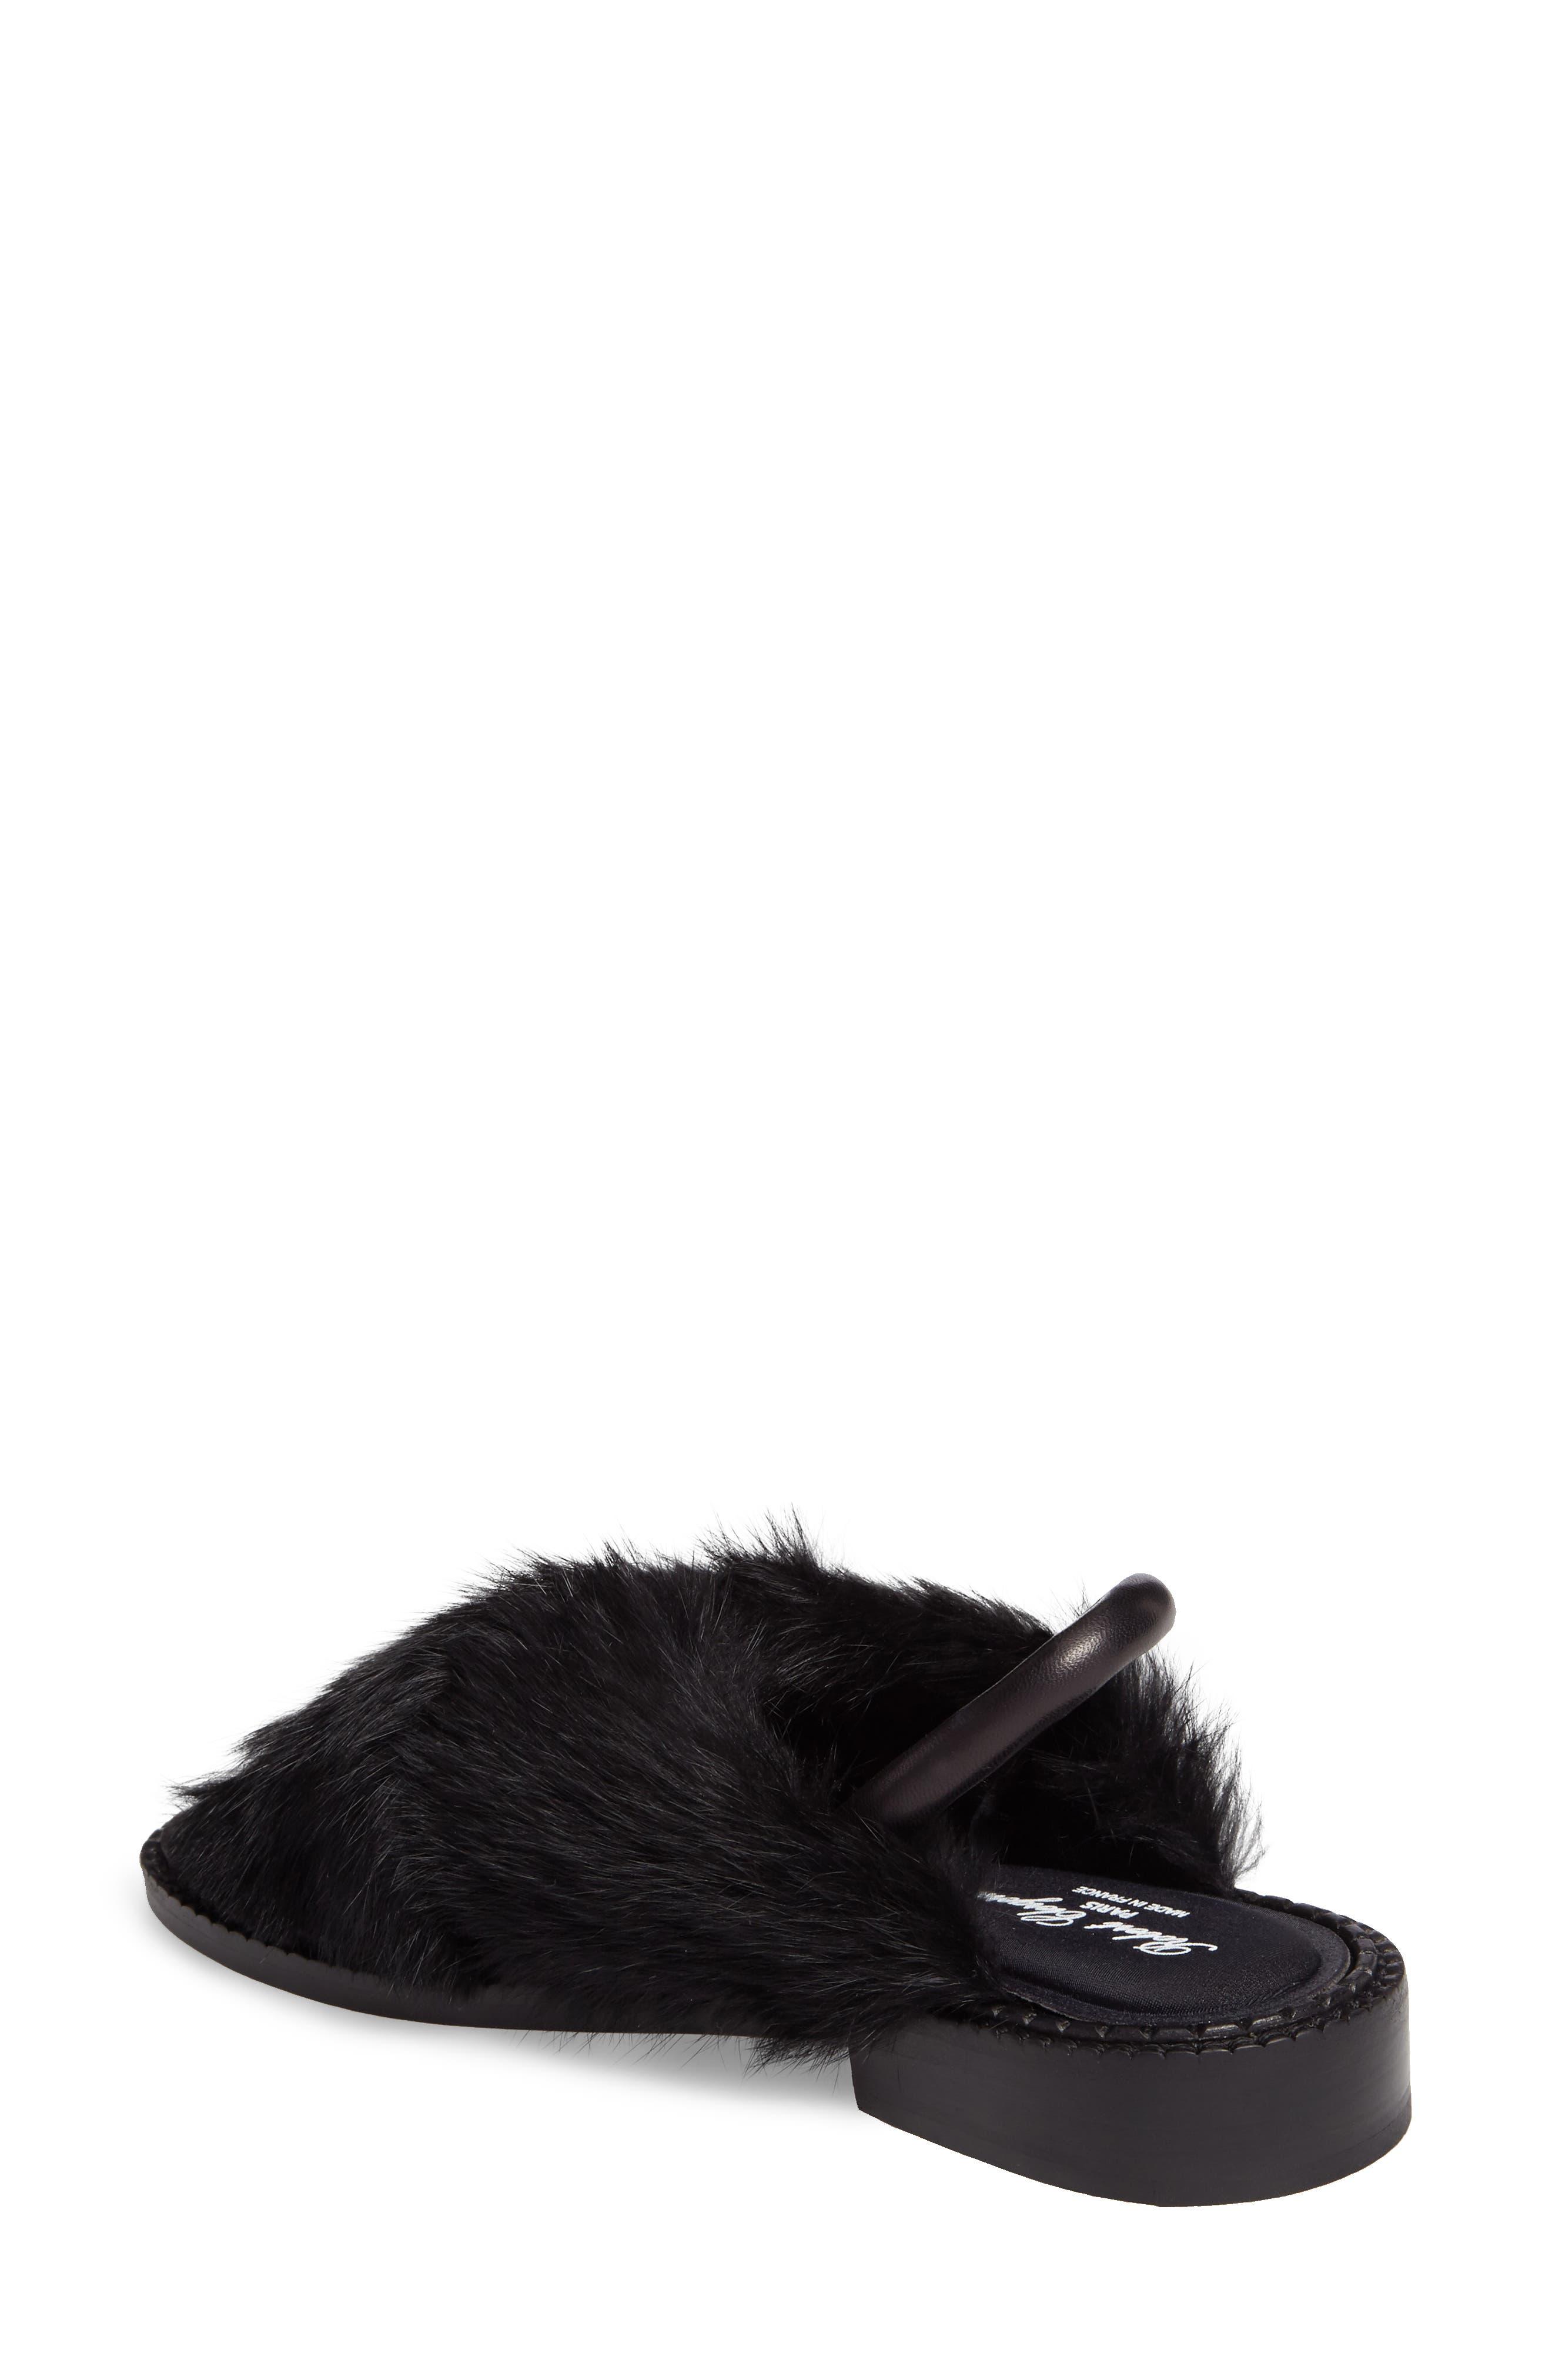 Bloss Genuine Fur Sandal,                             Alternate thumbnail 2, color,                             004